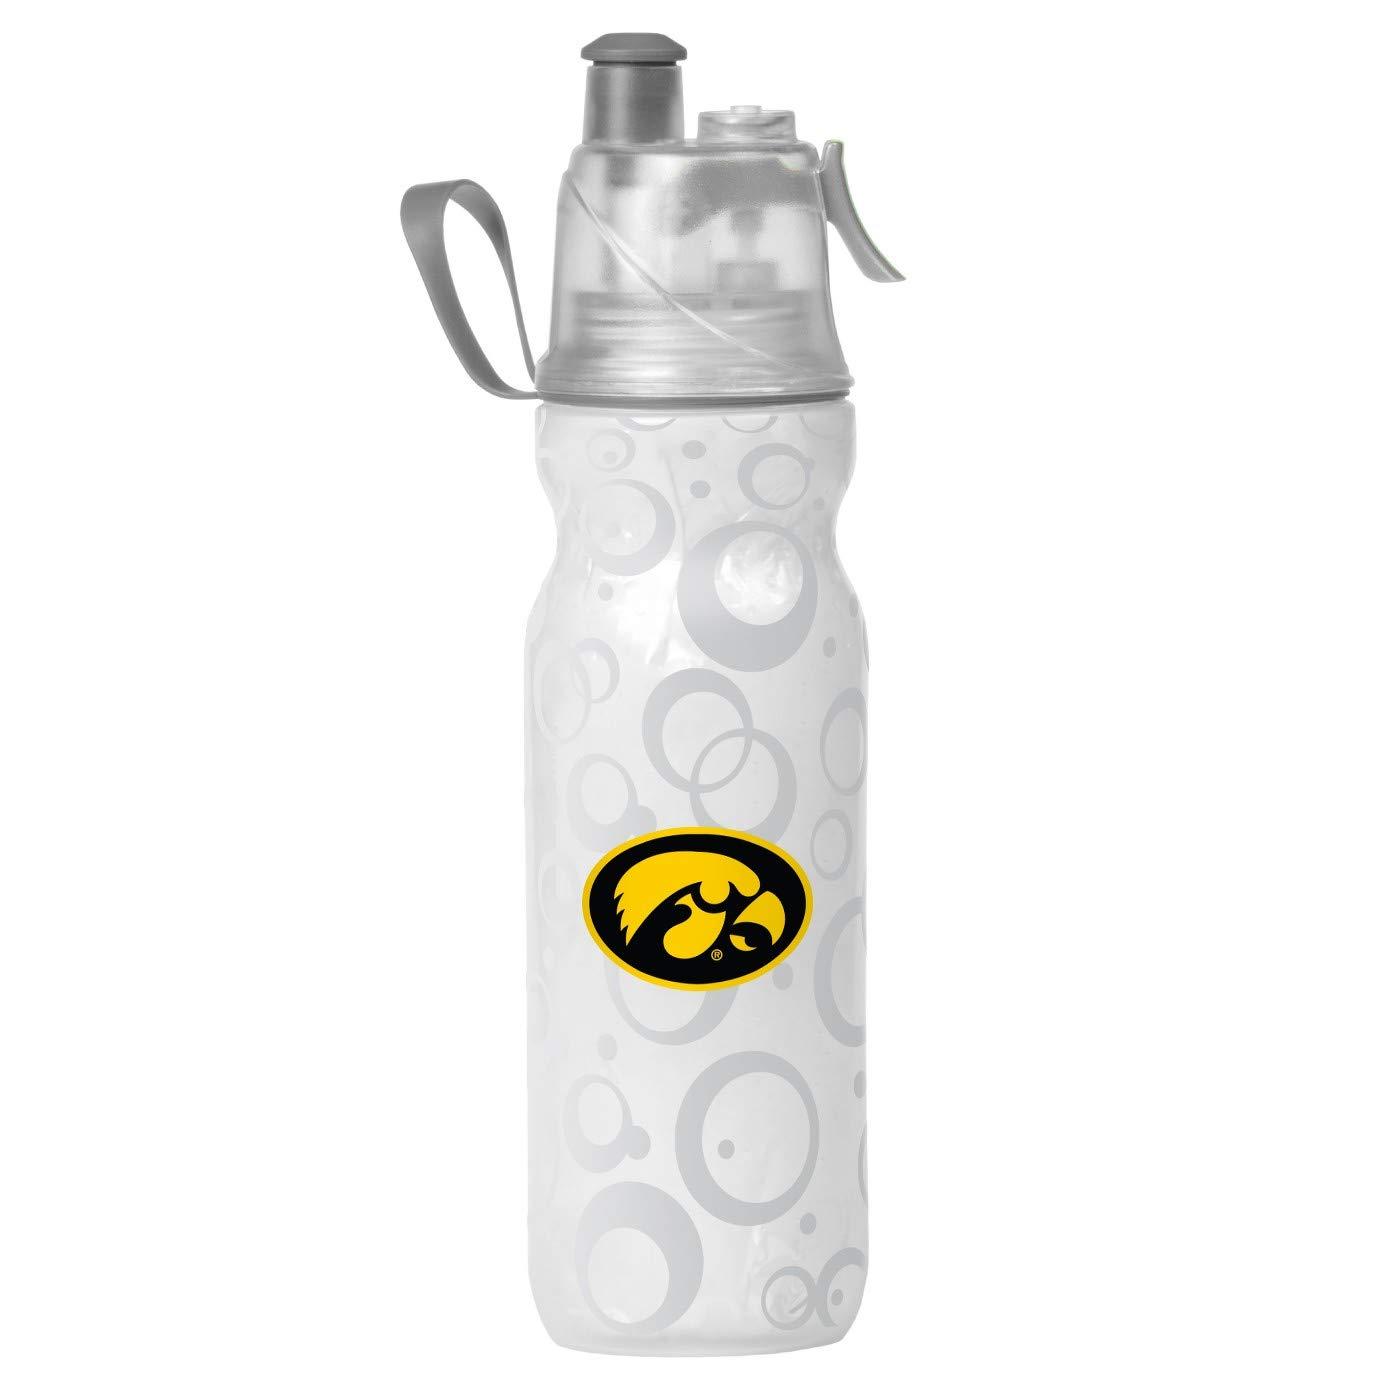 Iowa Hawkeyes Mist N Sip Water Bottle 20 oz.